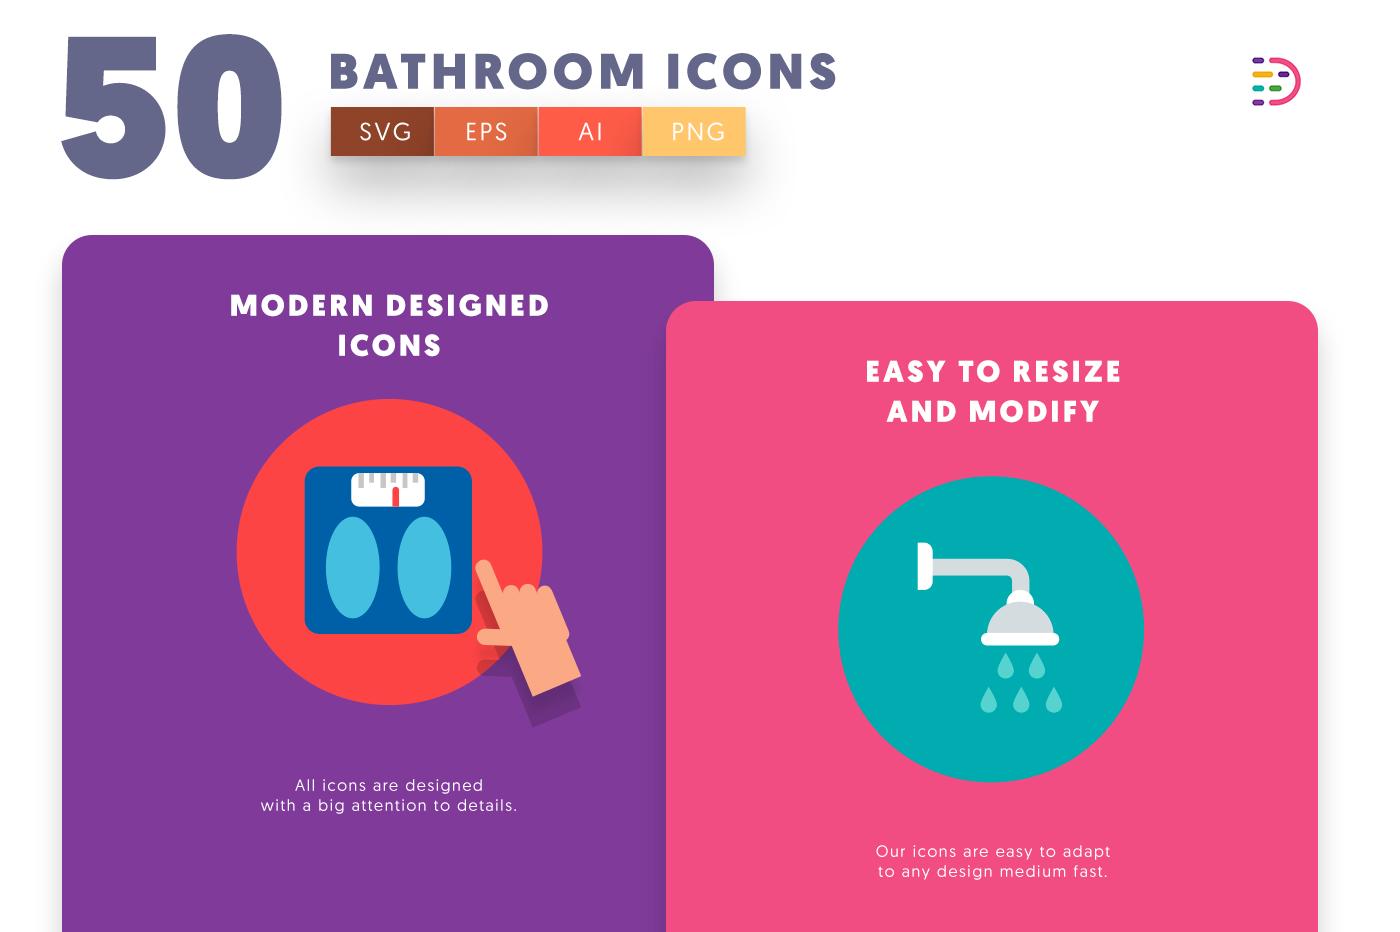 Design ready 50 Bathroom Icons